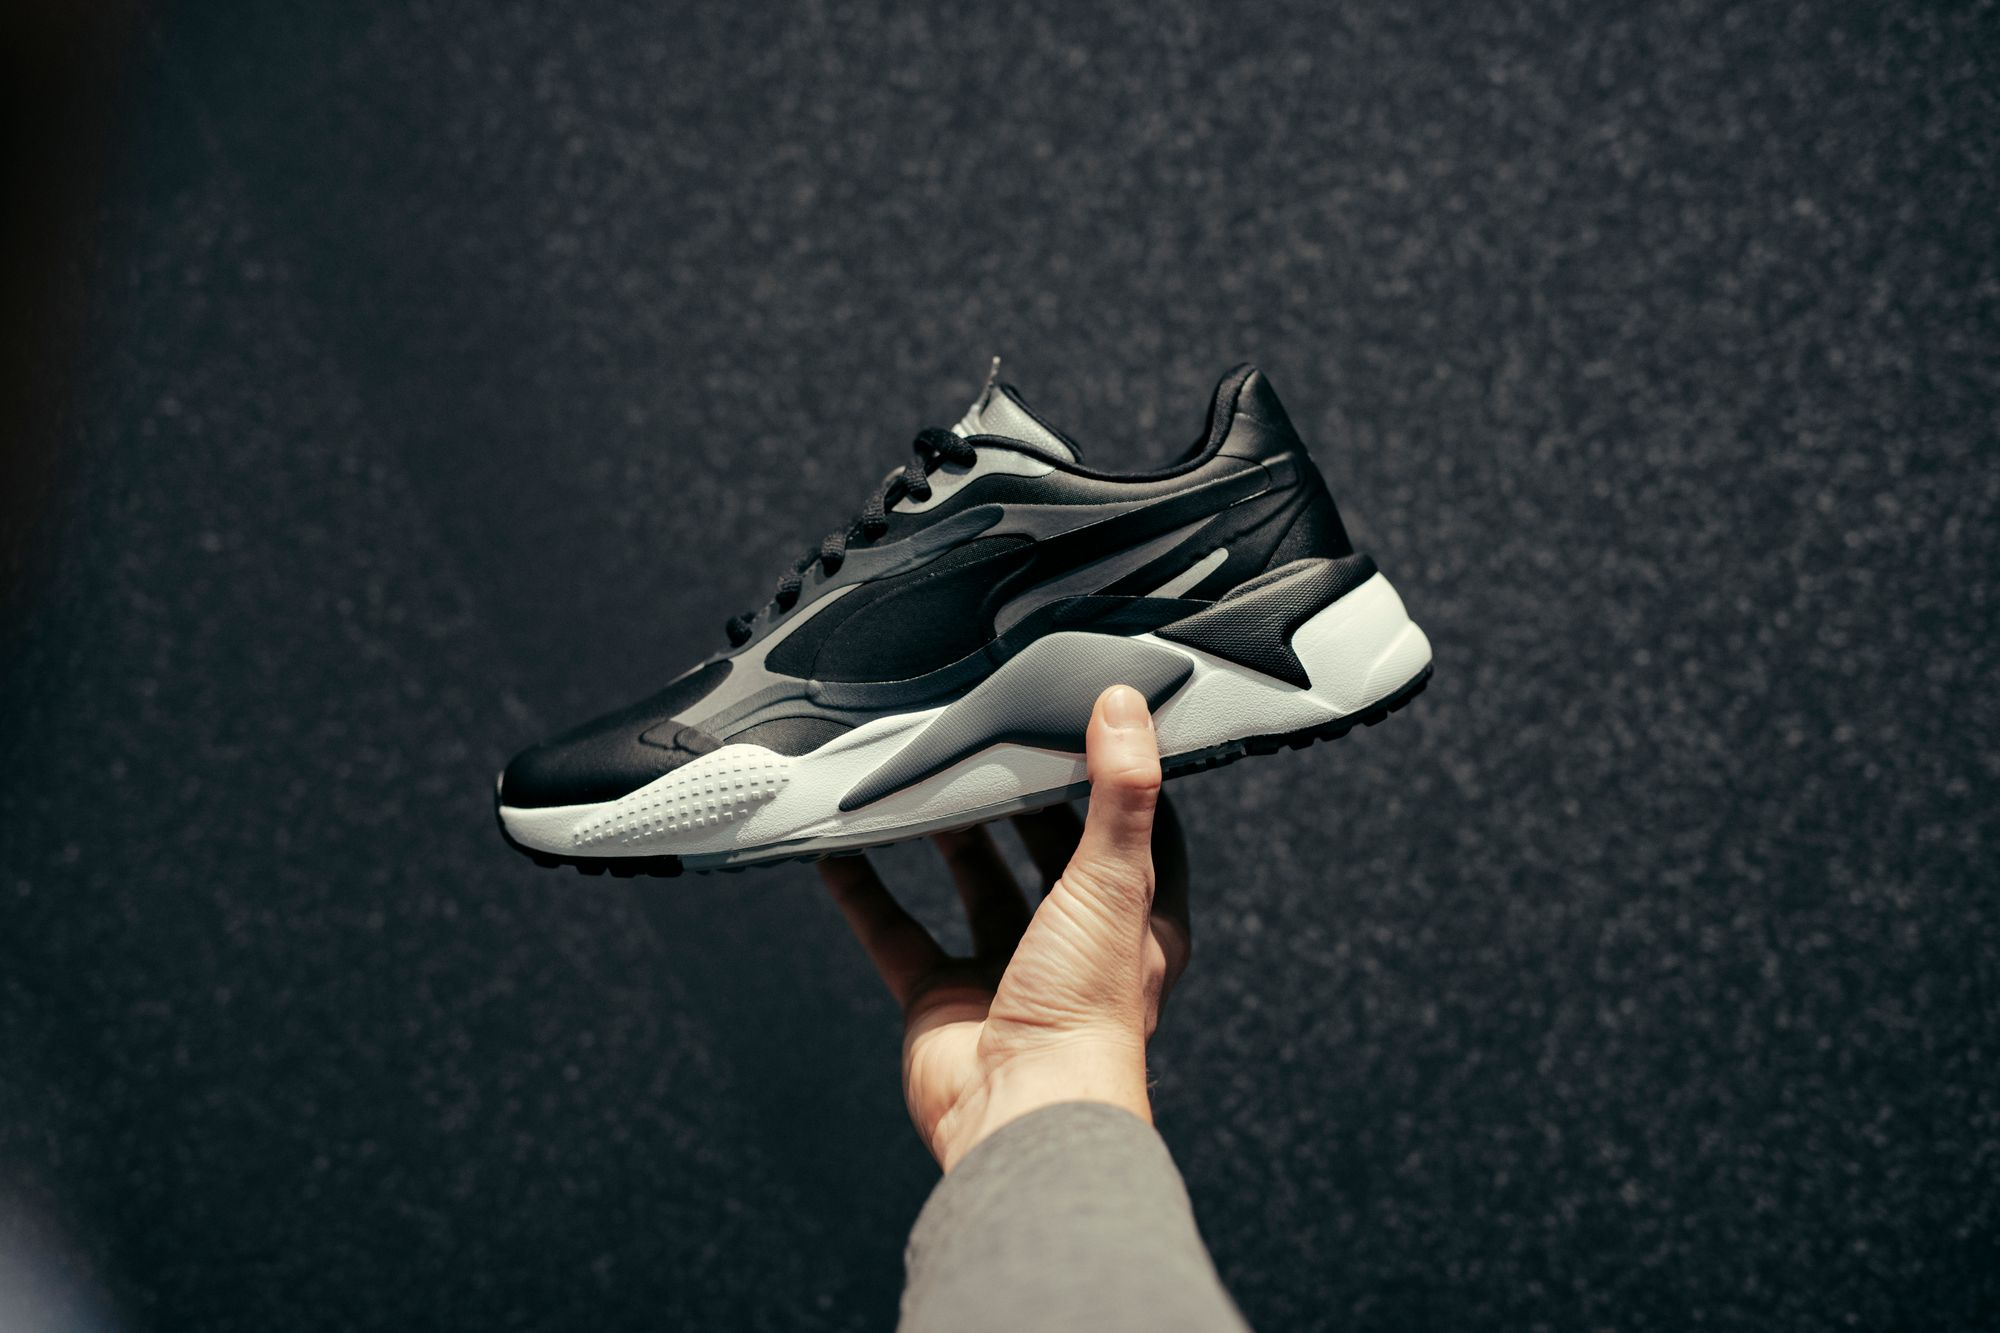 New Puma Rsg Shoes